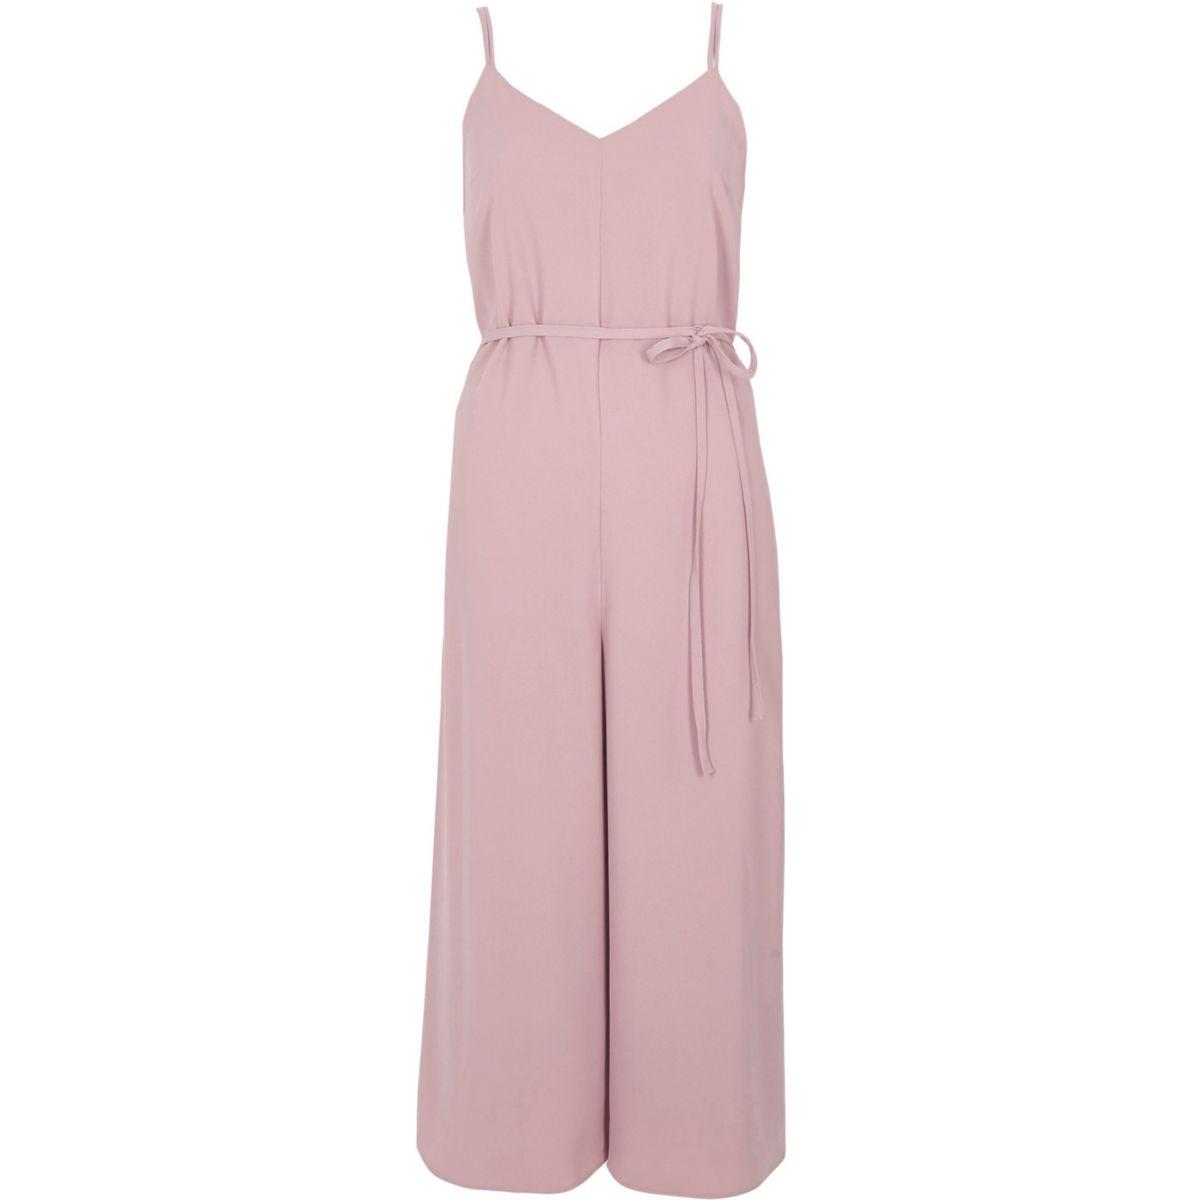 Light pink cami strappy back culotte jumpsuit